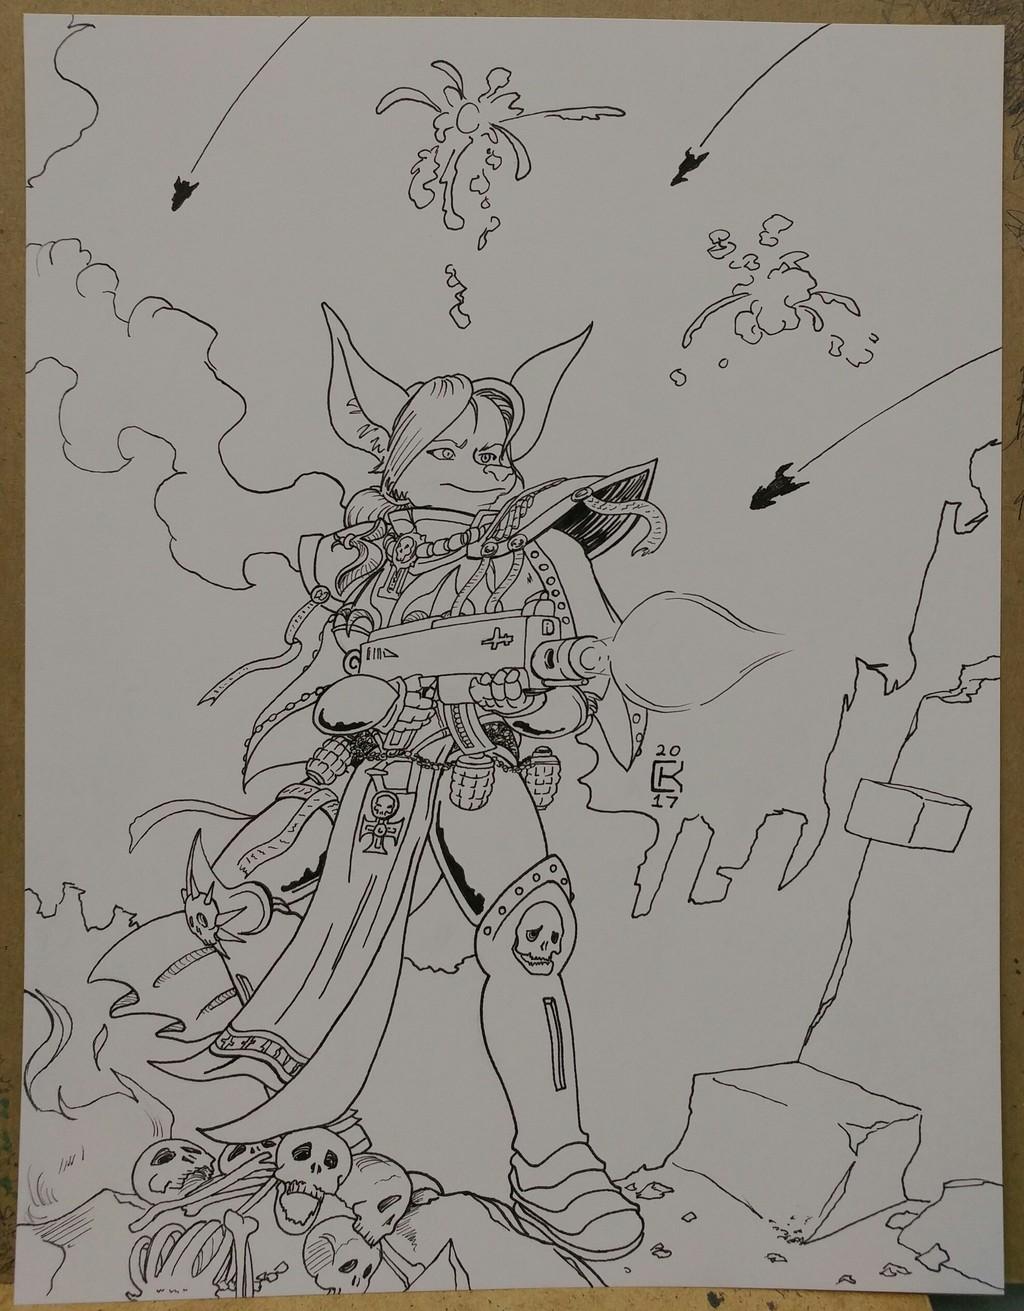 Most recent image: Raine battle commission inks